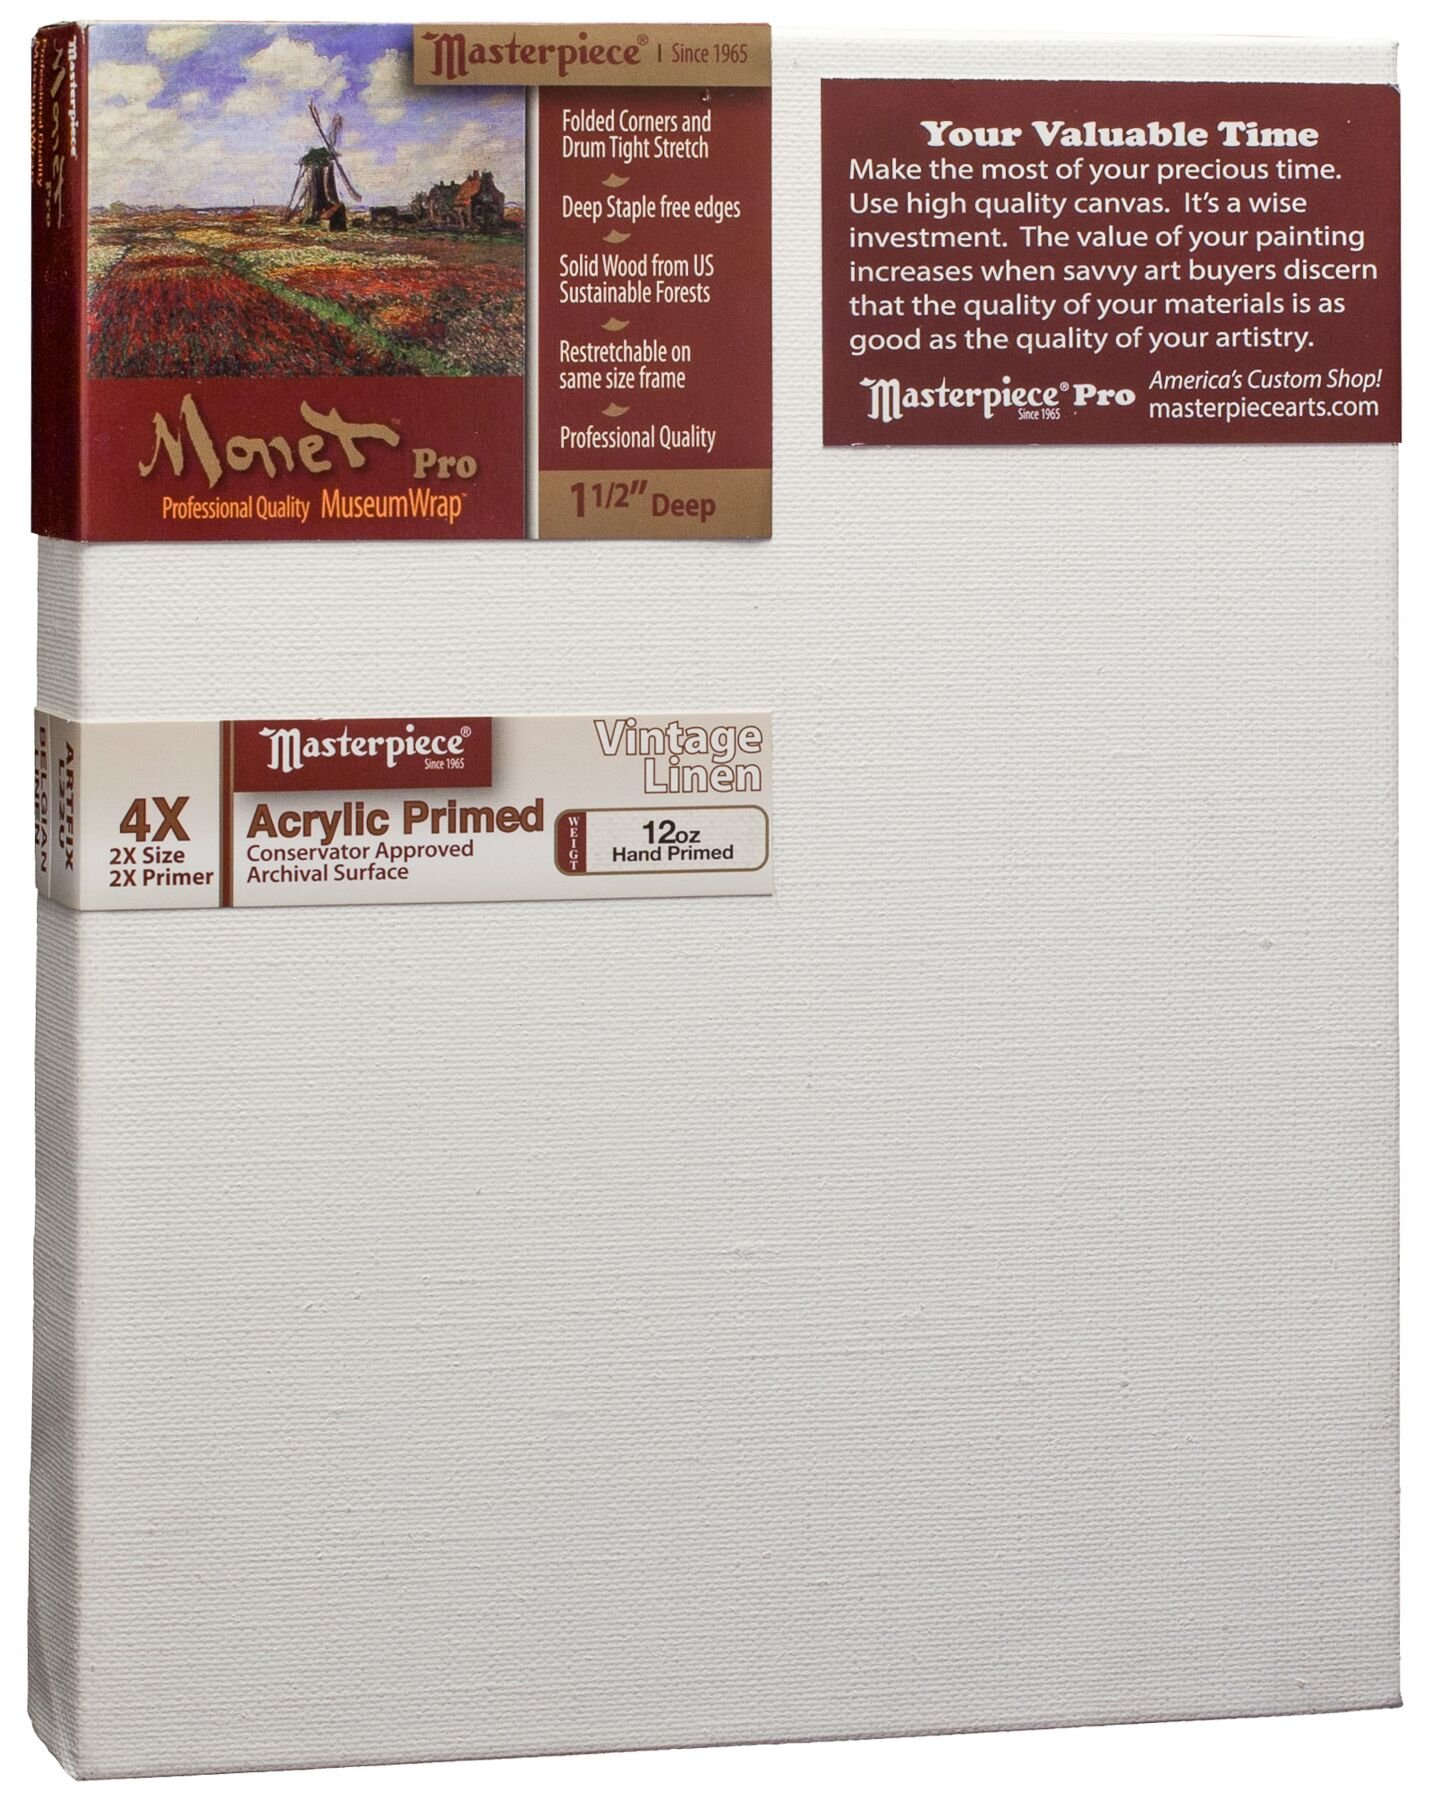 Masterpiece Artist Canvas MU-3645 Monet Pro 1-1/2'' Deep, 36'' x 45'', Linen12.0oz - 4X - Vintage Acrylic Primed